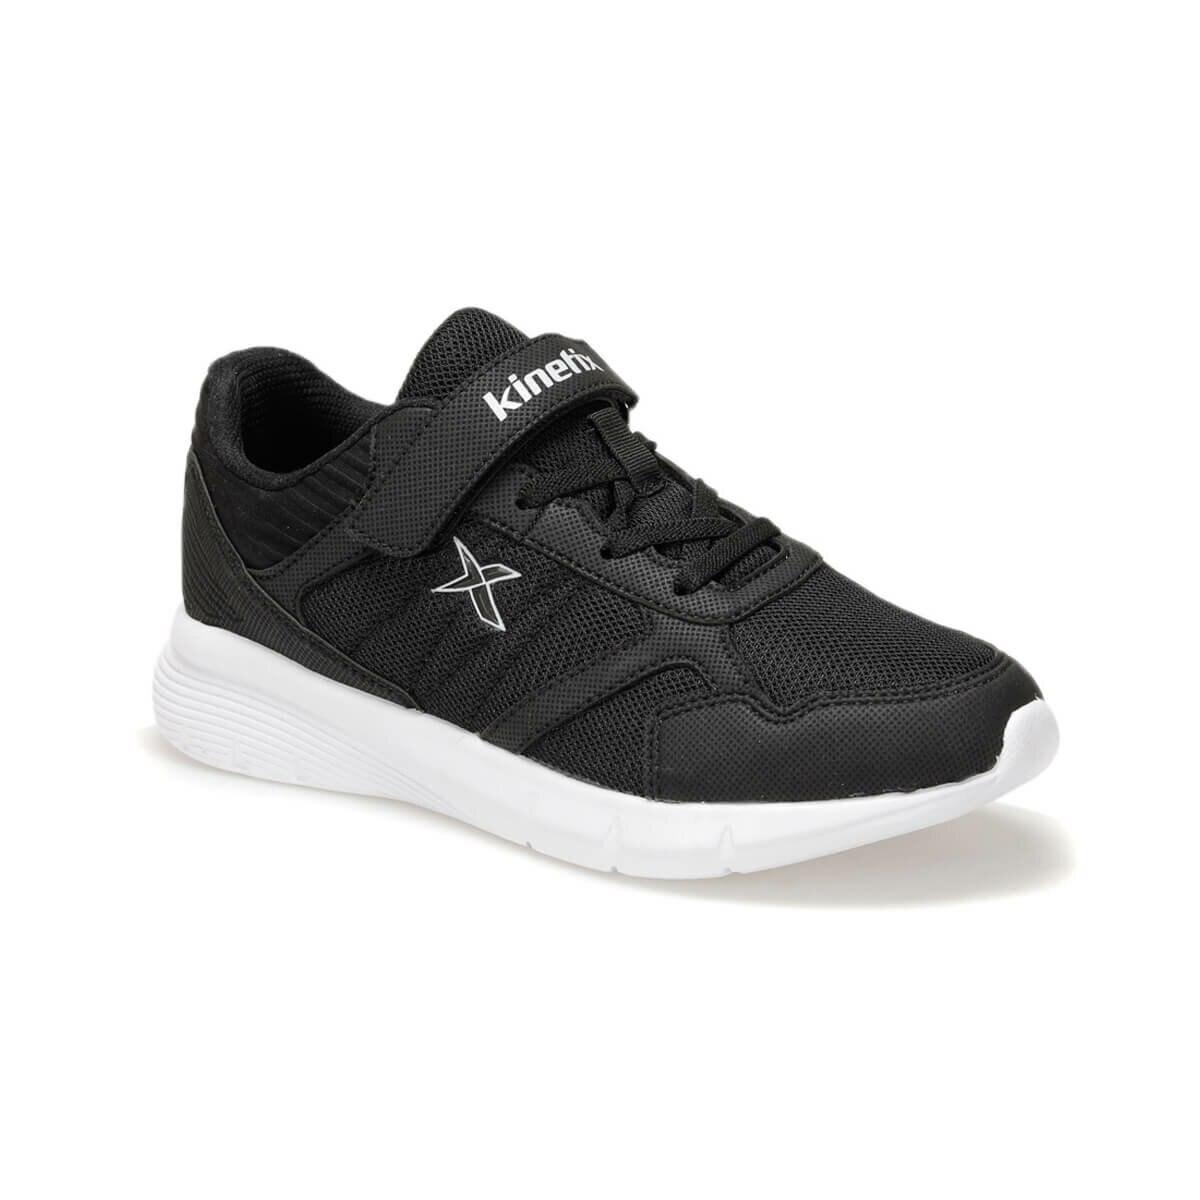 FLO FORMUS J Black Male Child Hiking Shoes KINETIX